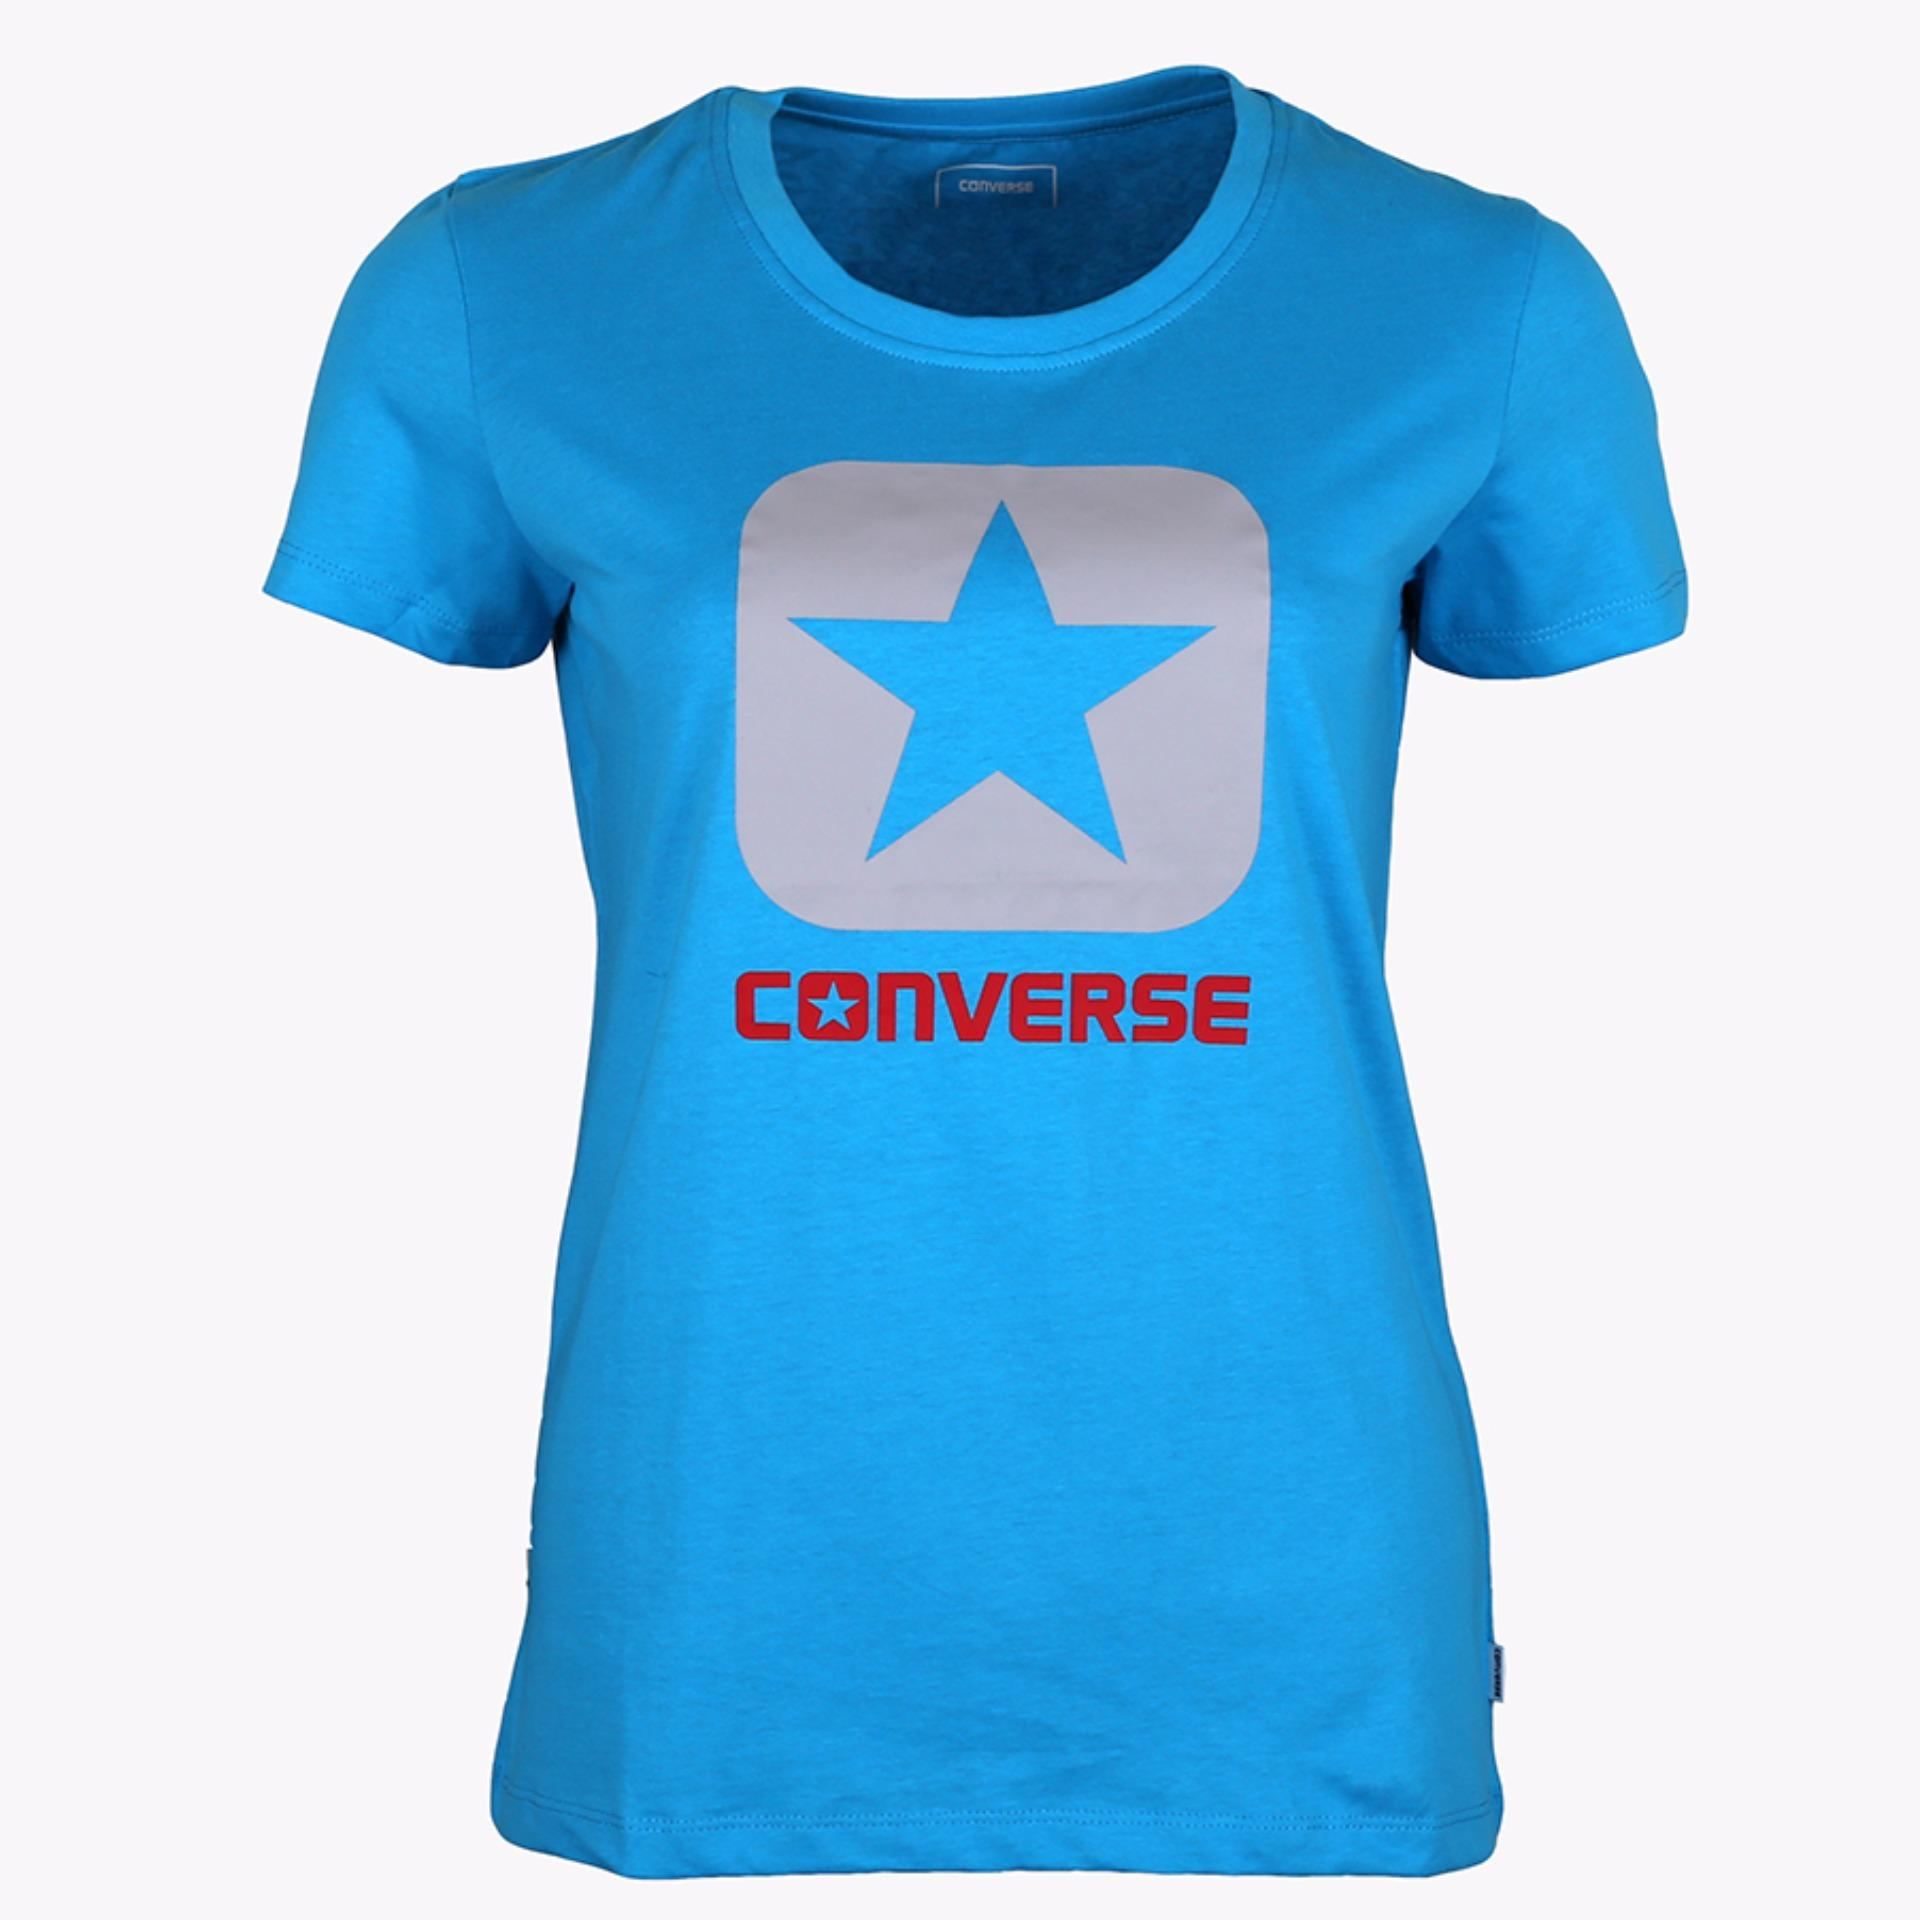 Dimana Beli Converse Women S T Shirt Biru Converse